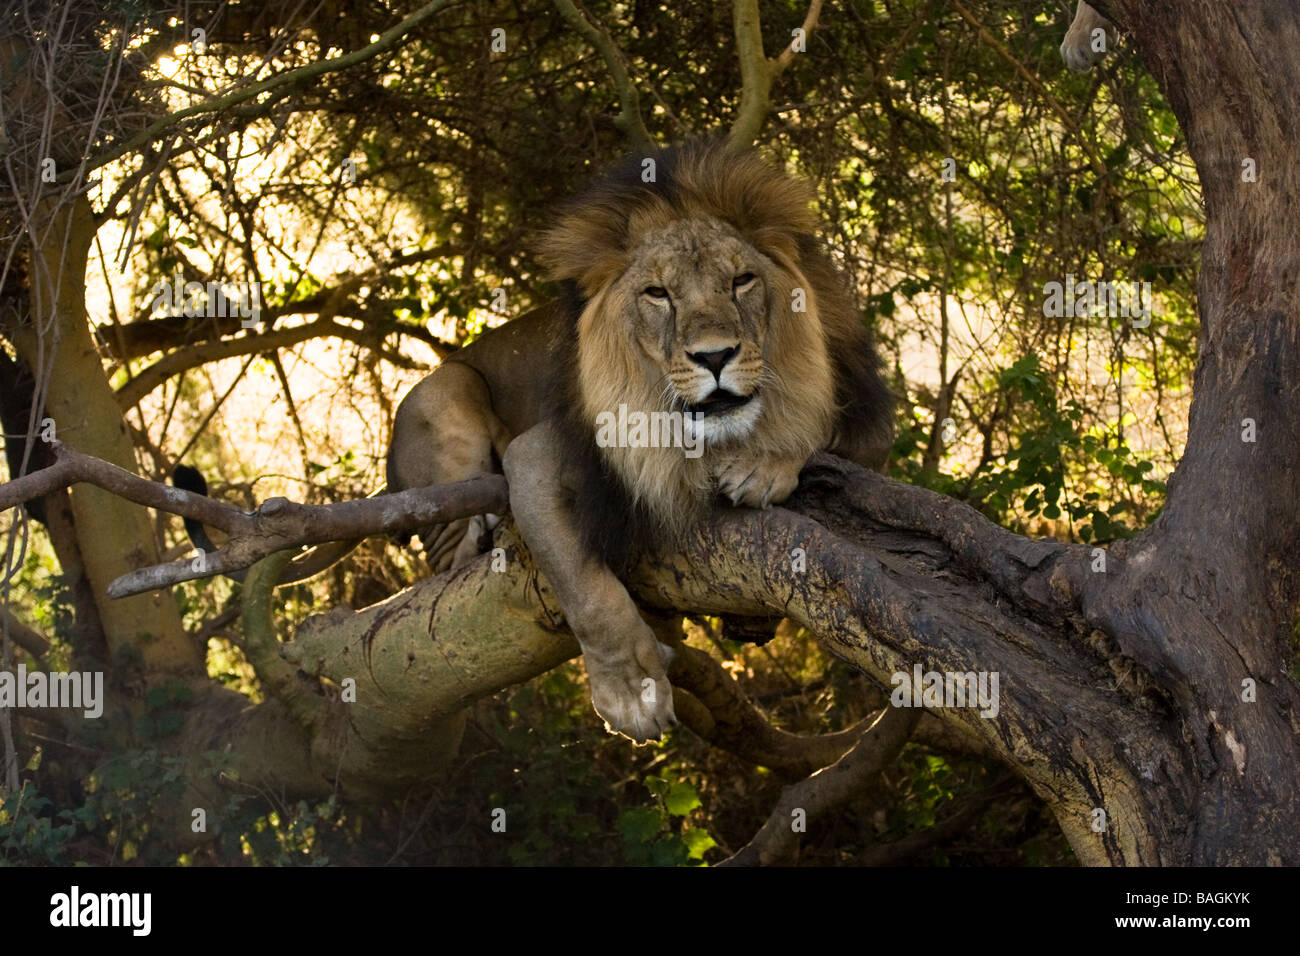 Lion in tree Stock Photo